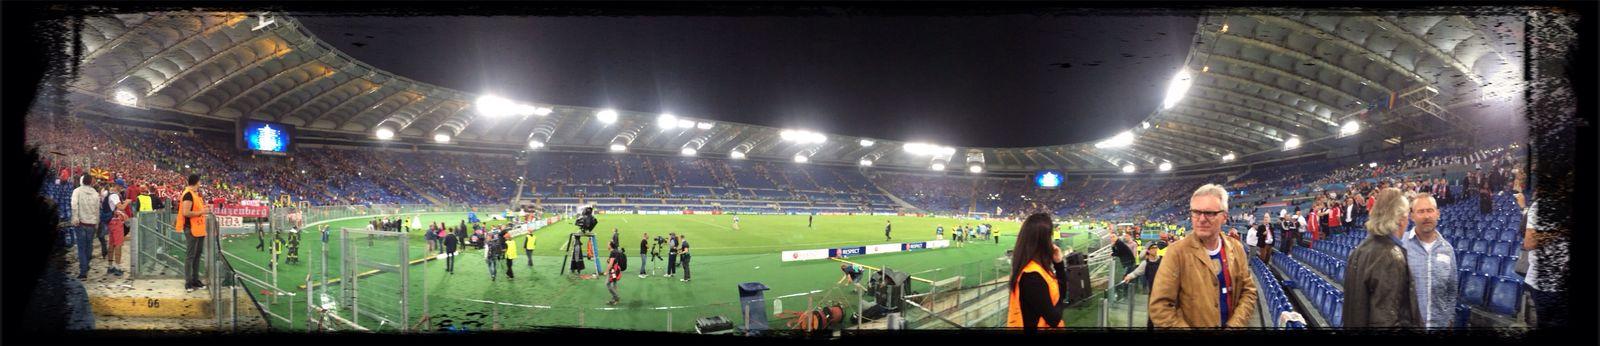 Roma Bayern Champions League ⚽️????? Taking Photos ??